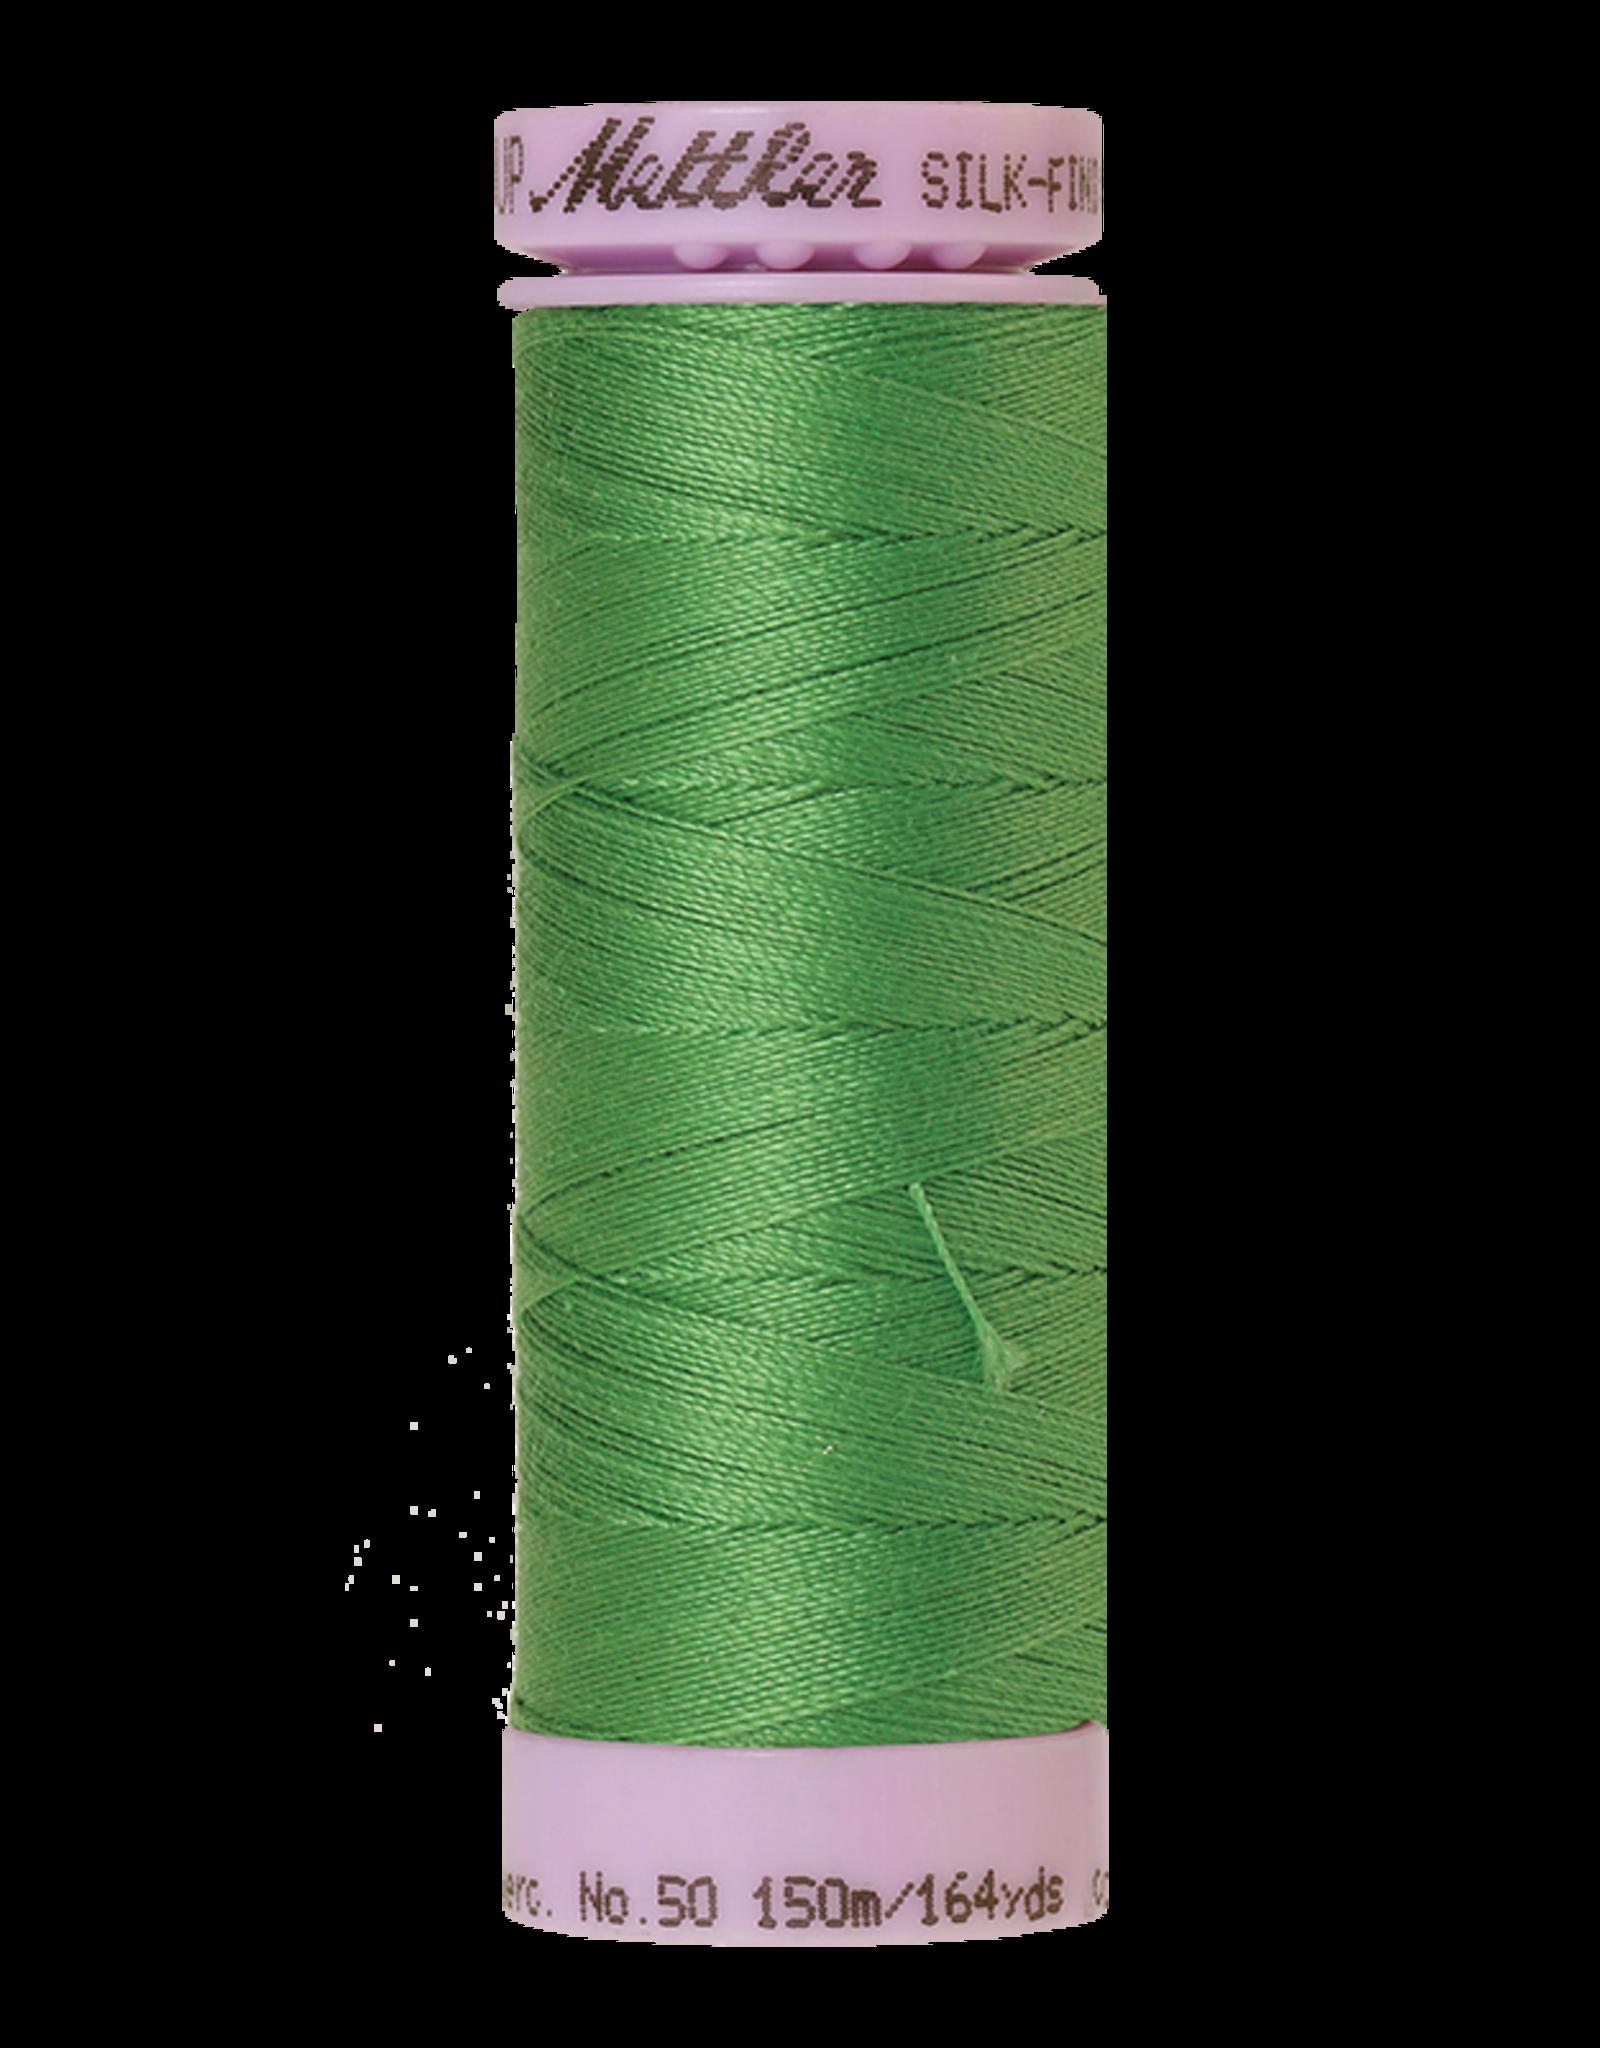 Mettler Silk Finish Cotton 50 - 150 meter - 1314